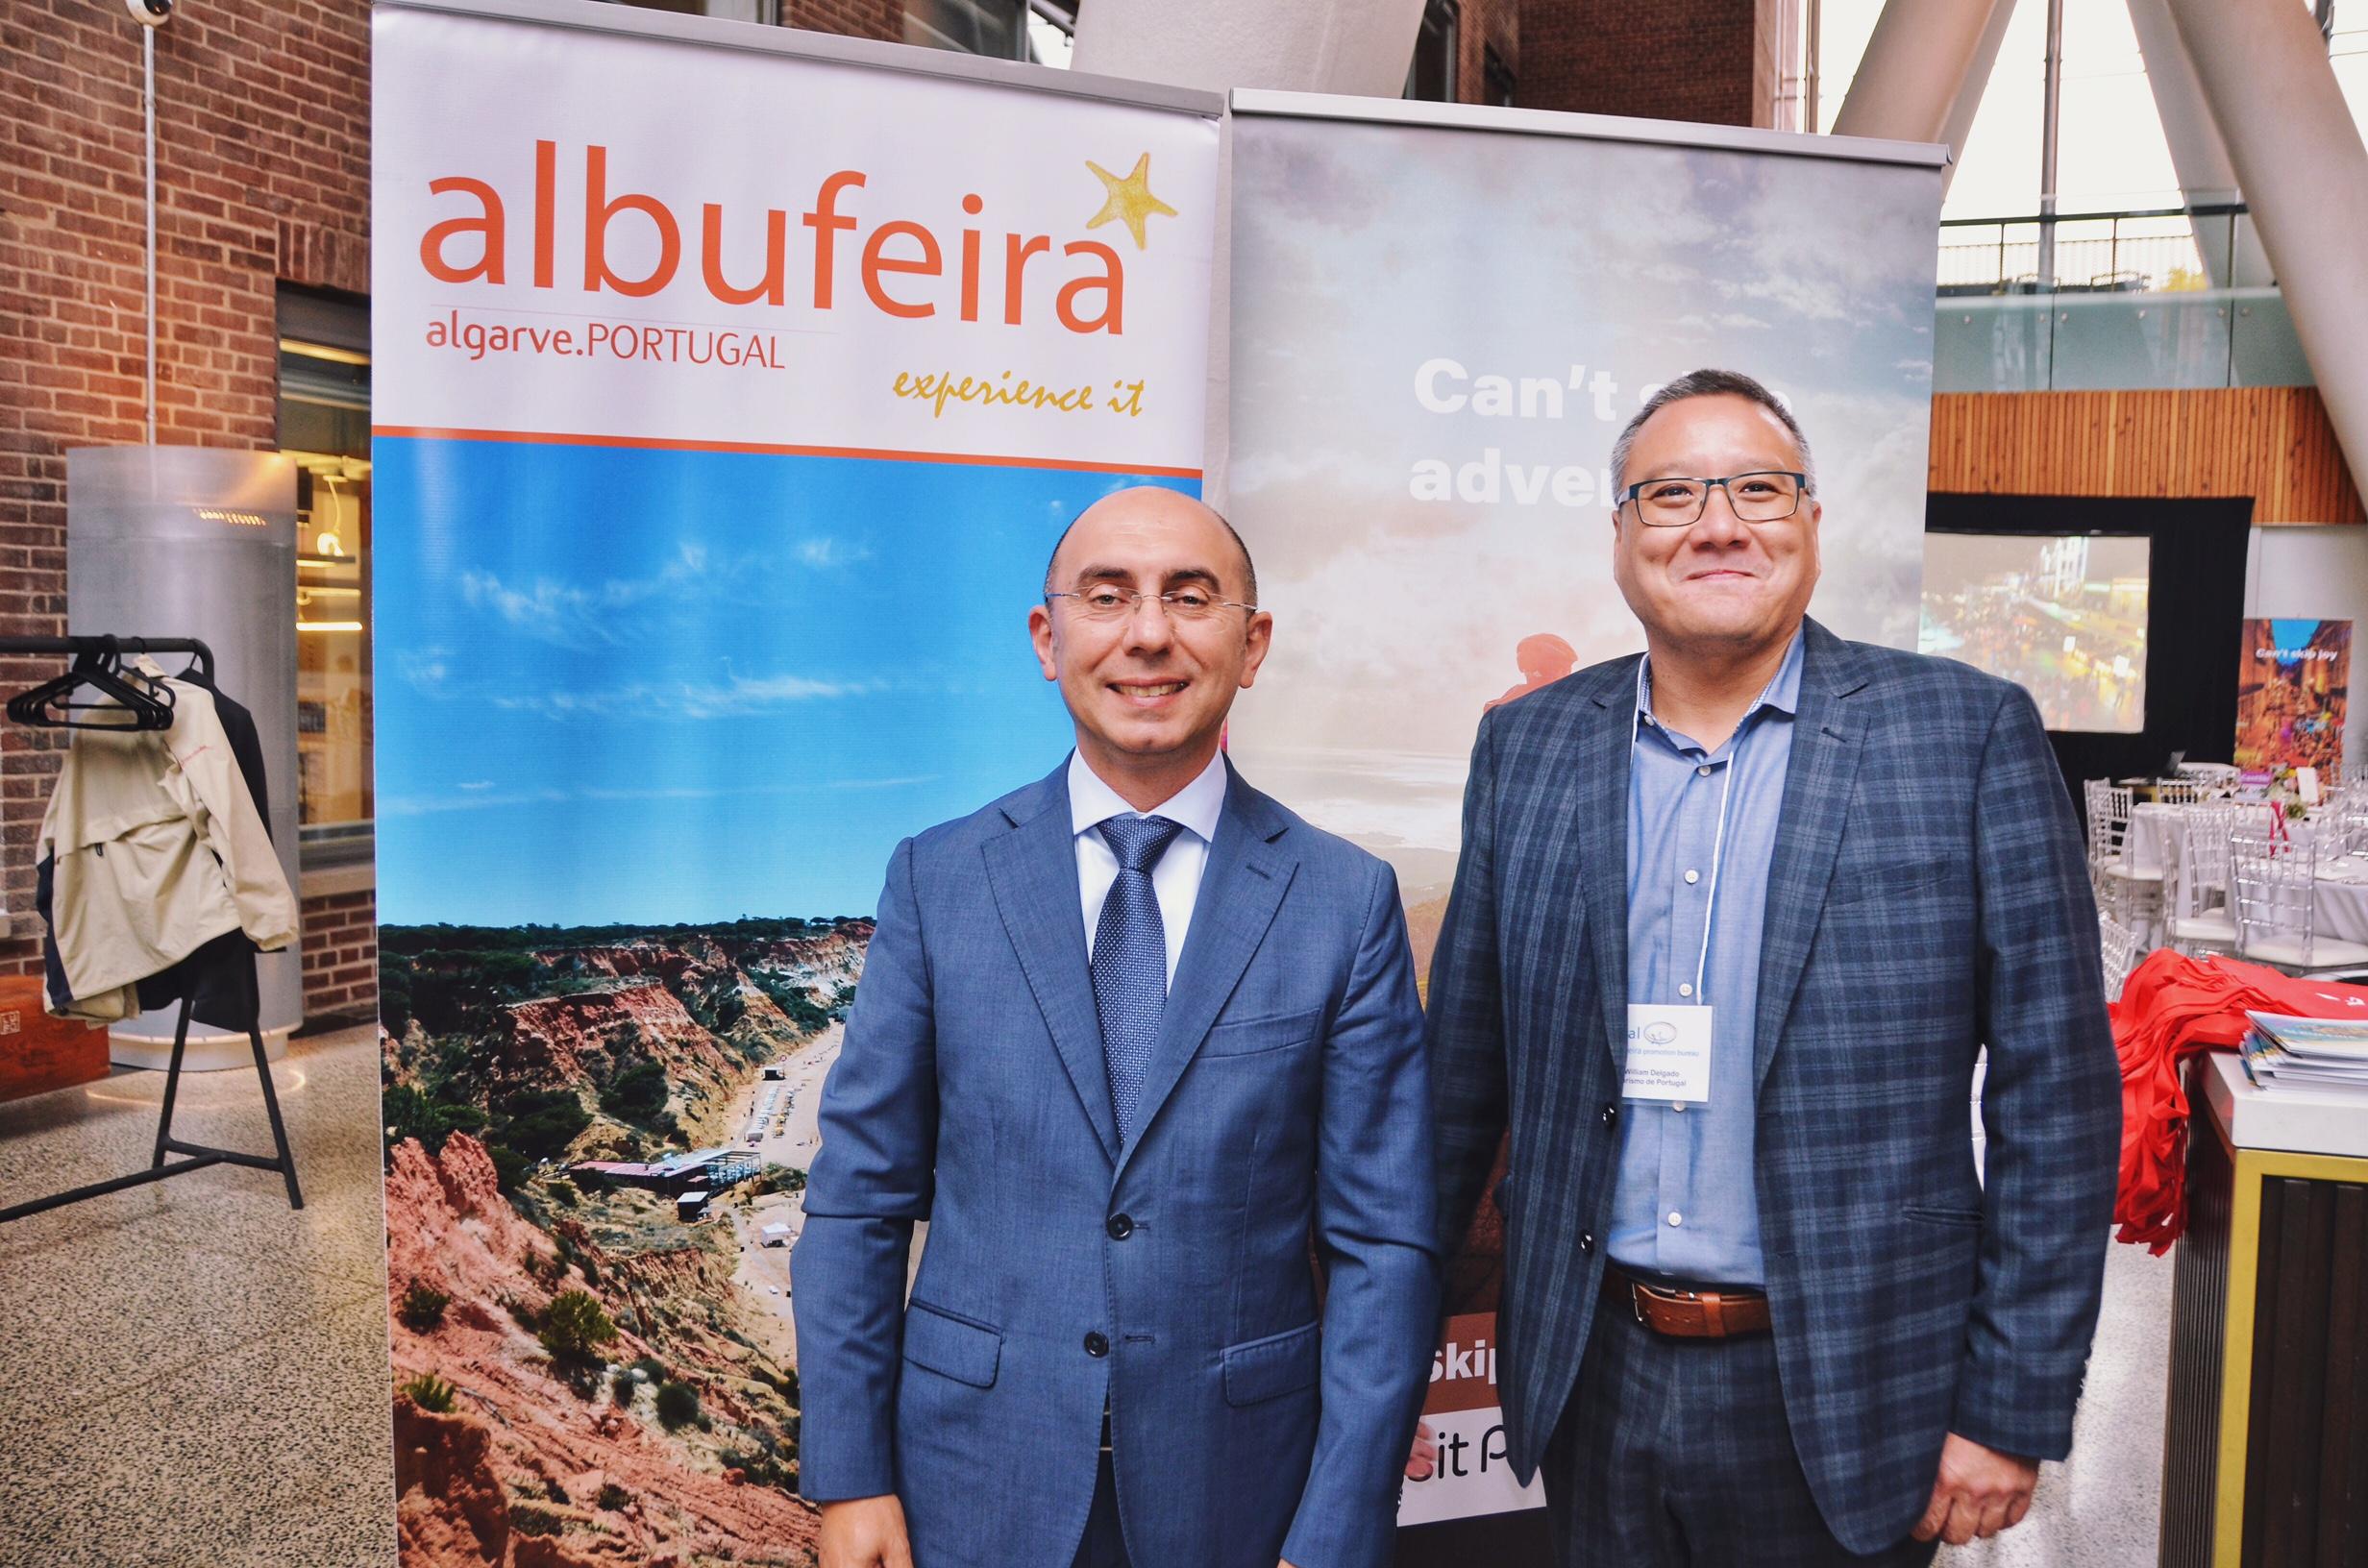 Albufeira: A Gem In The Algarve